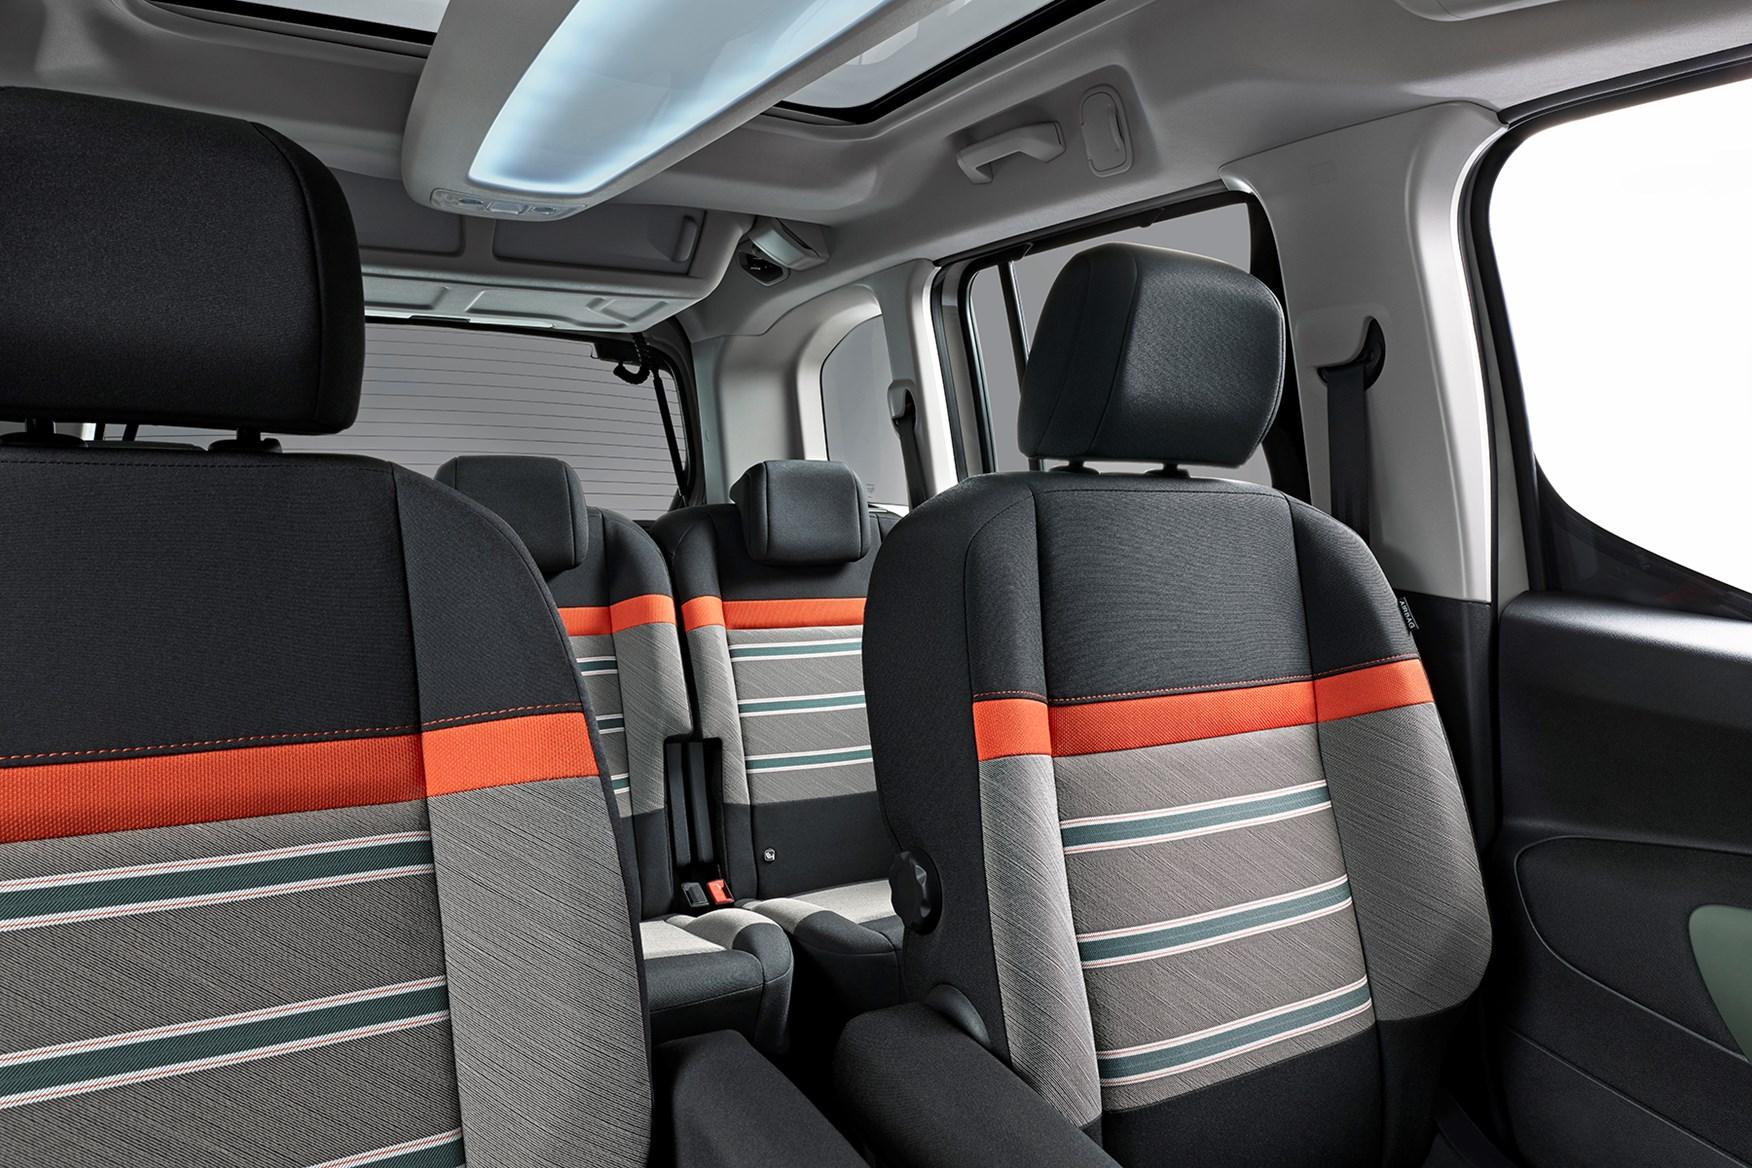 ... Citroen Berlingo interior detail ...